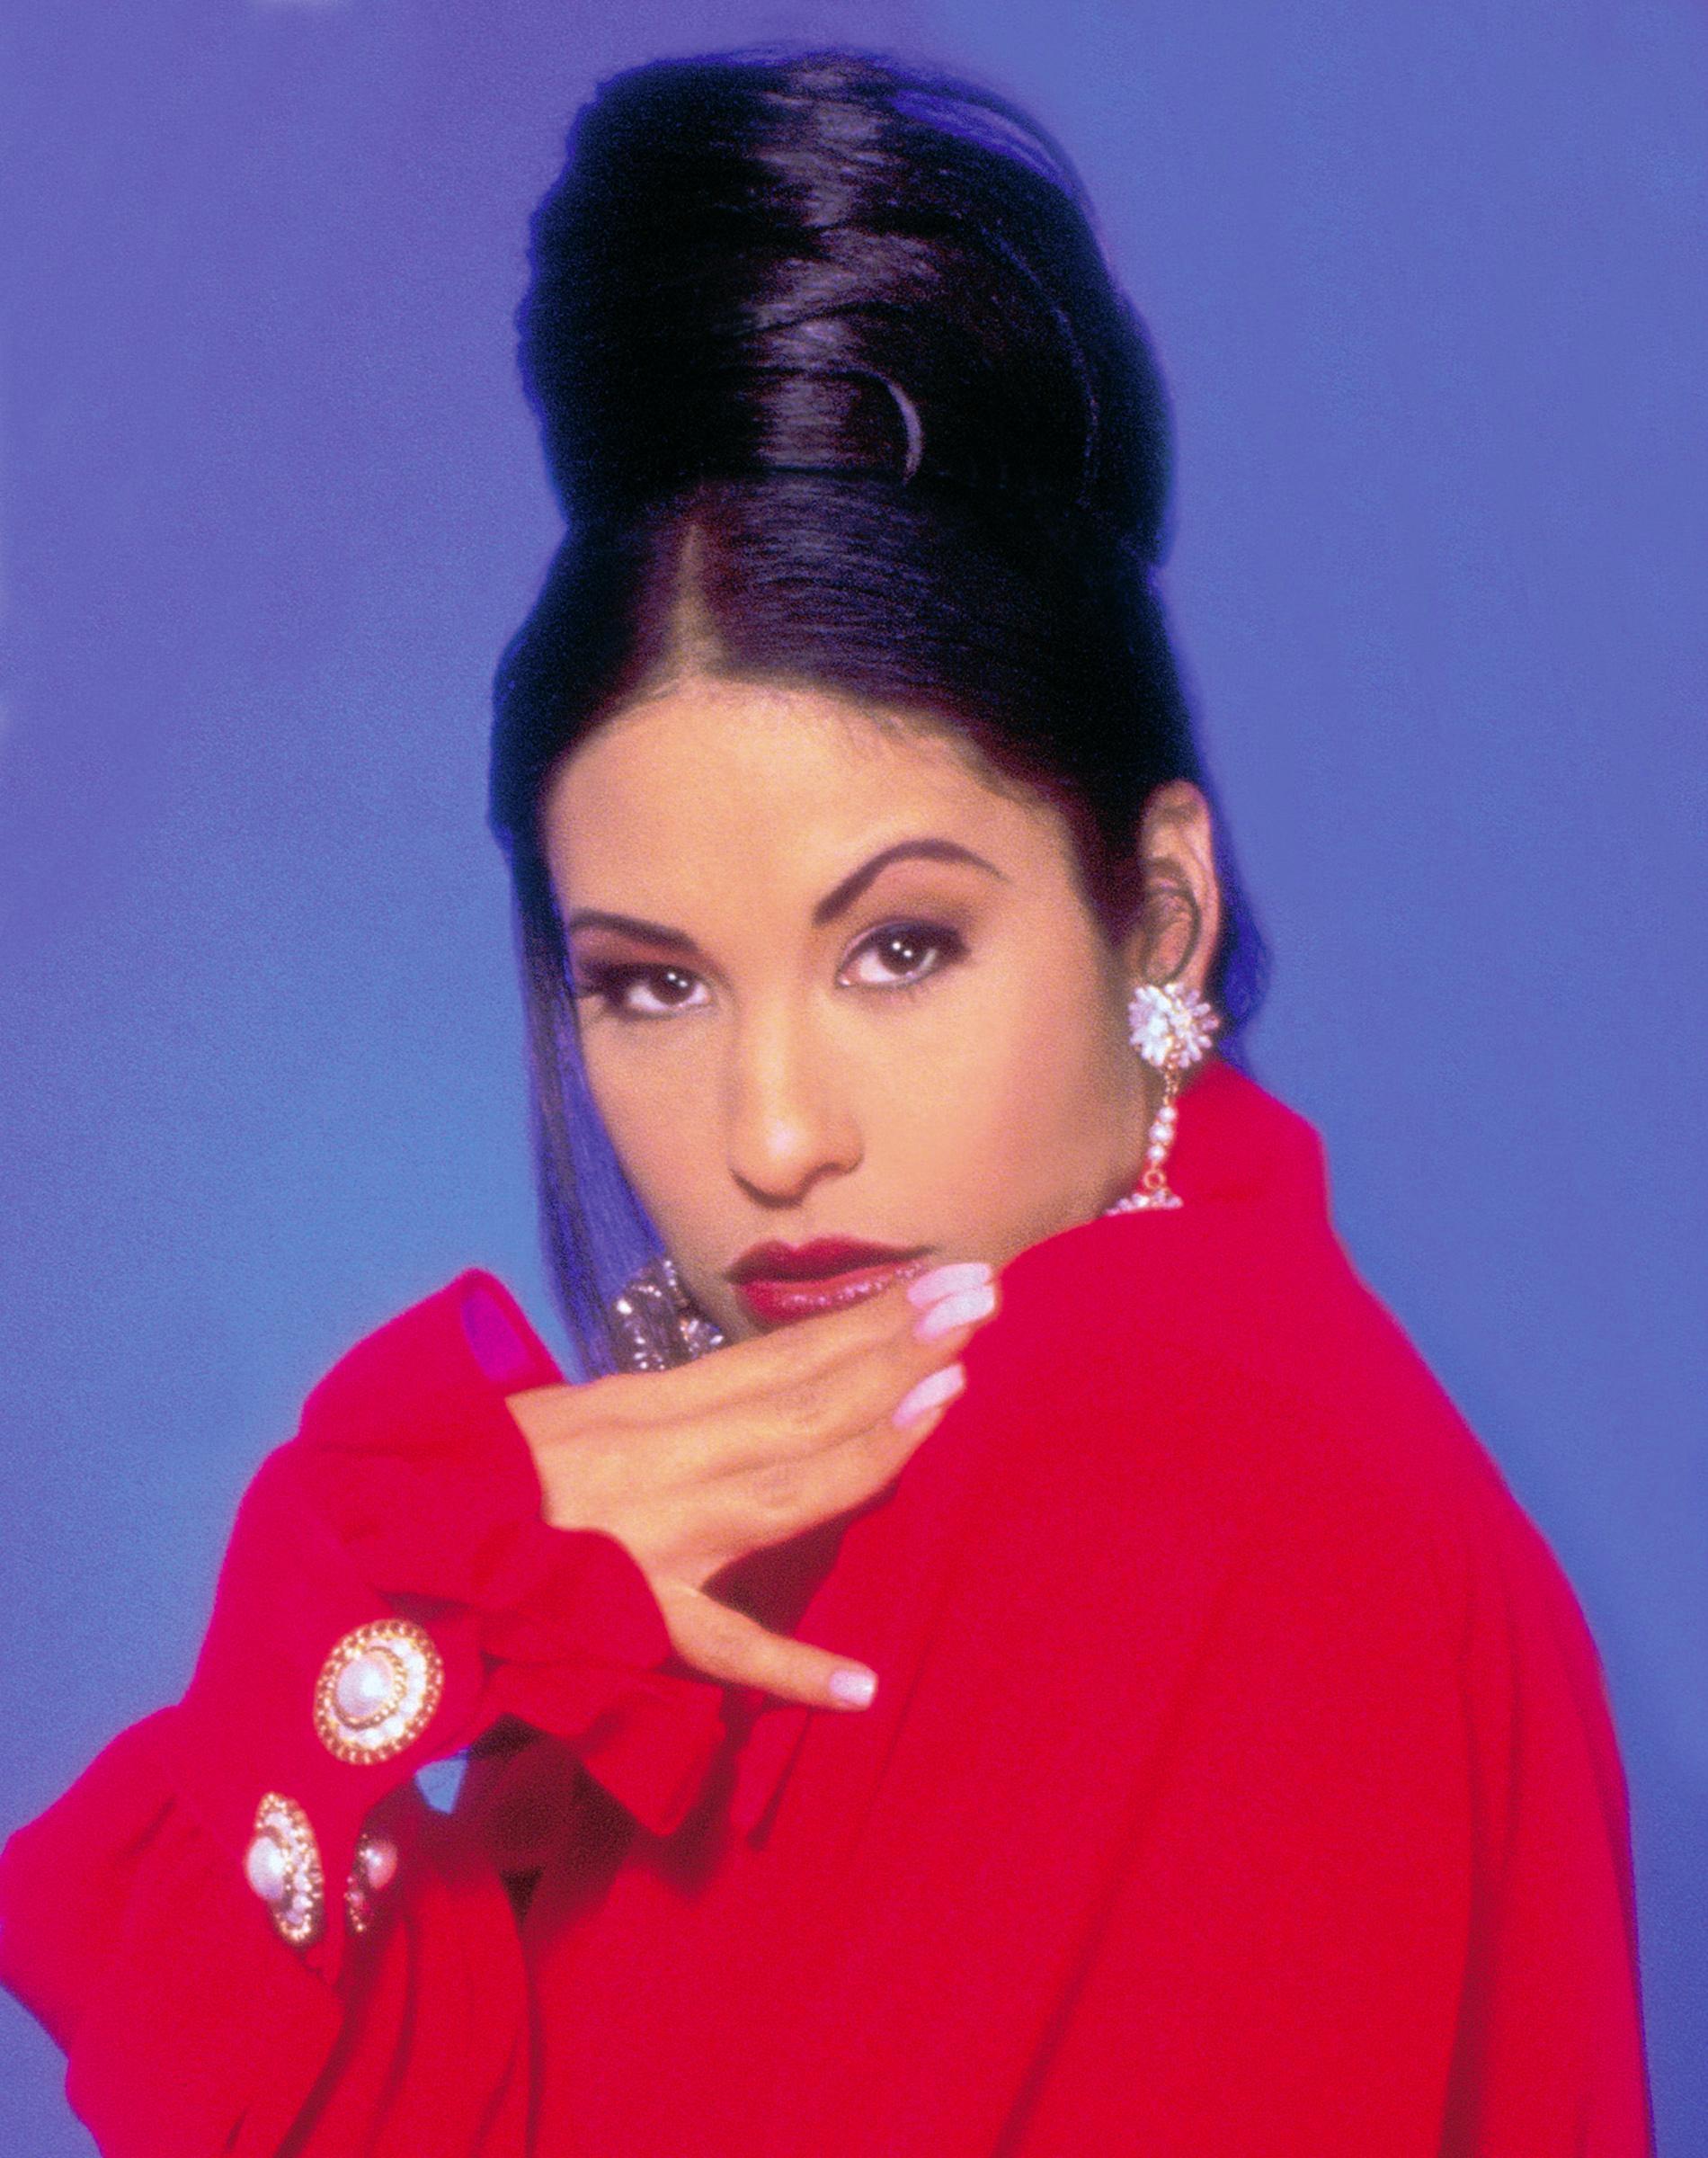 Selena Quintanilla - Albums Songs & Murder - Biography